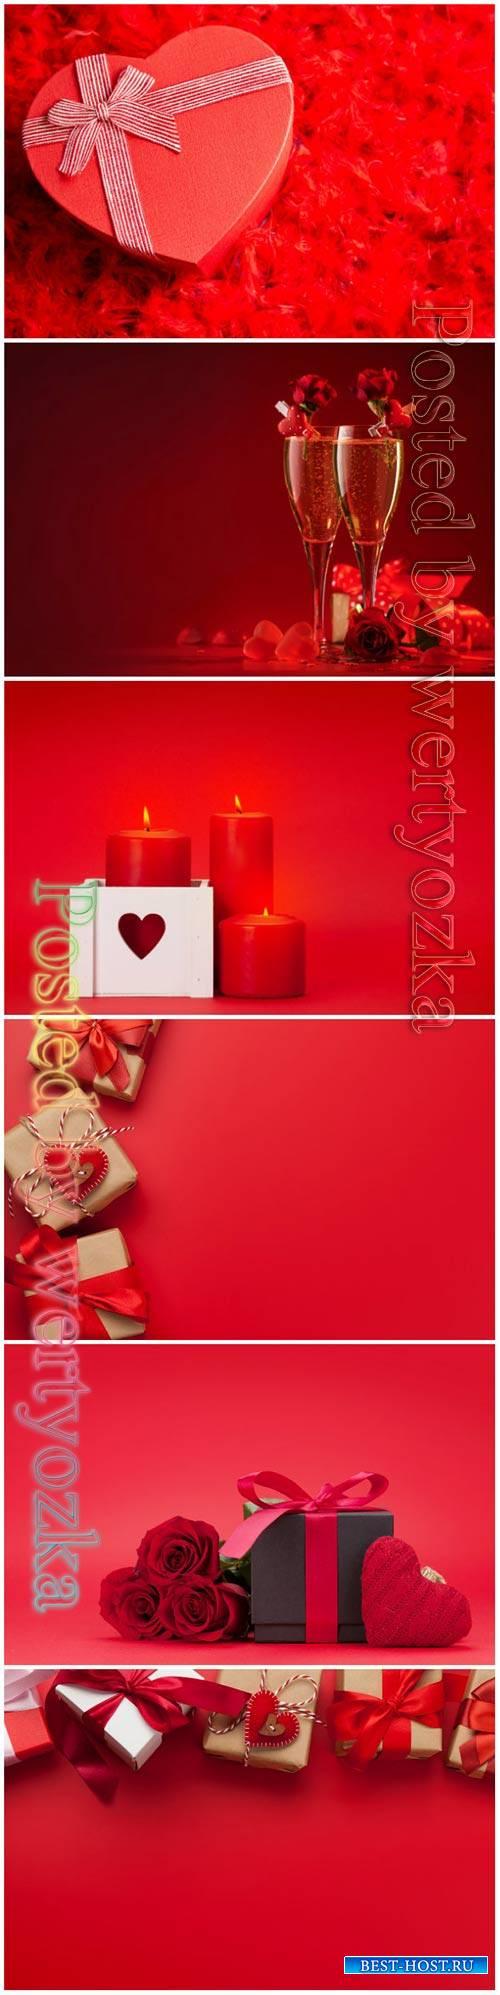 Valentines day beautiful stock photo # 3